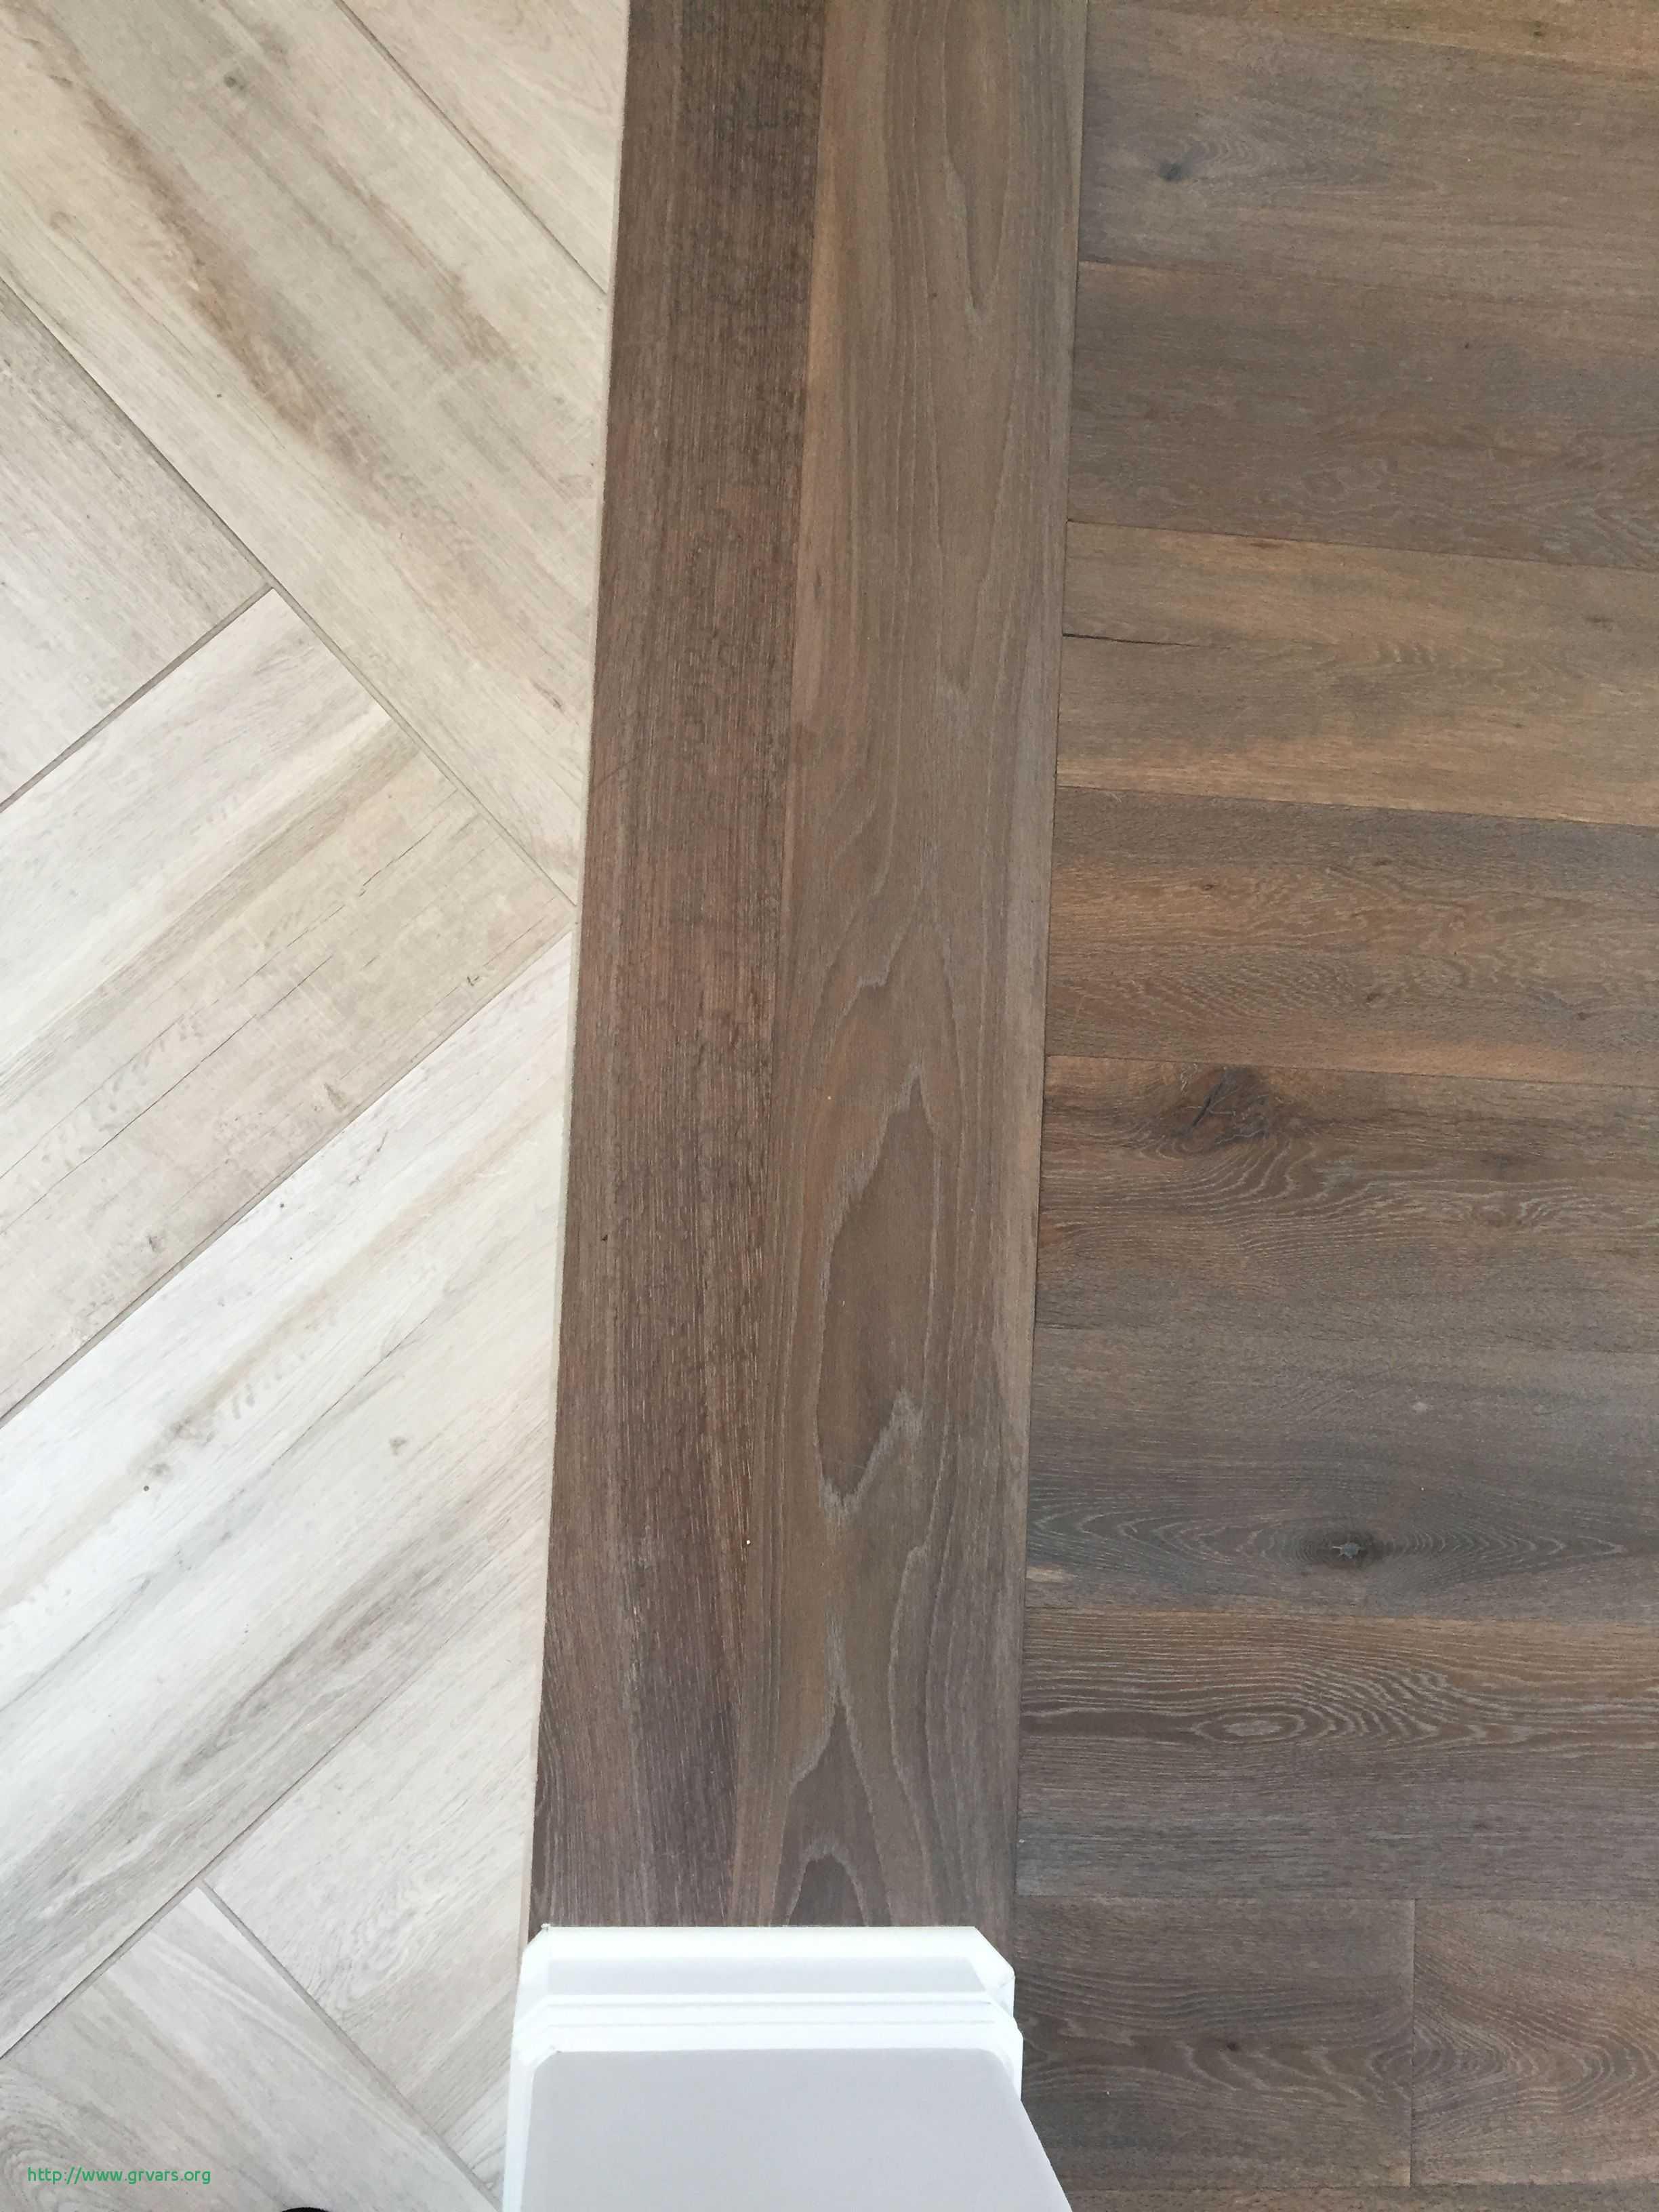 hardwood flooring over osb of diy laminate flooring on concrete impressionnant plywood or osb for throughout diy laminate flooring on concrete impressionnant floor transition laminate to herringbone tile pattern